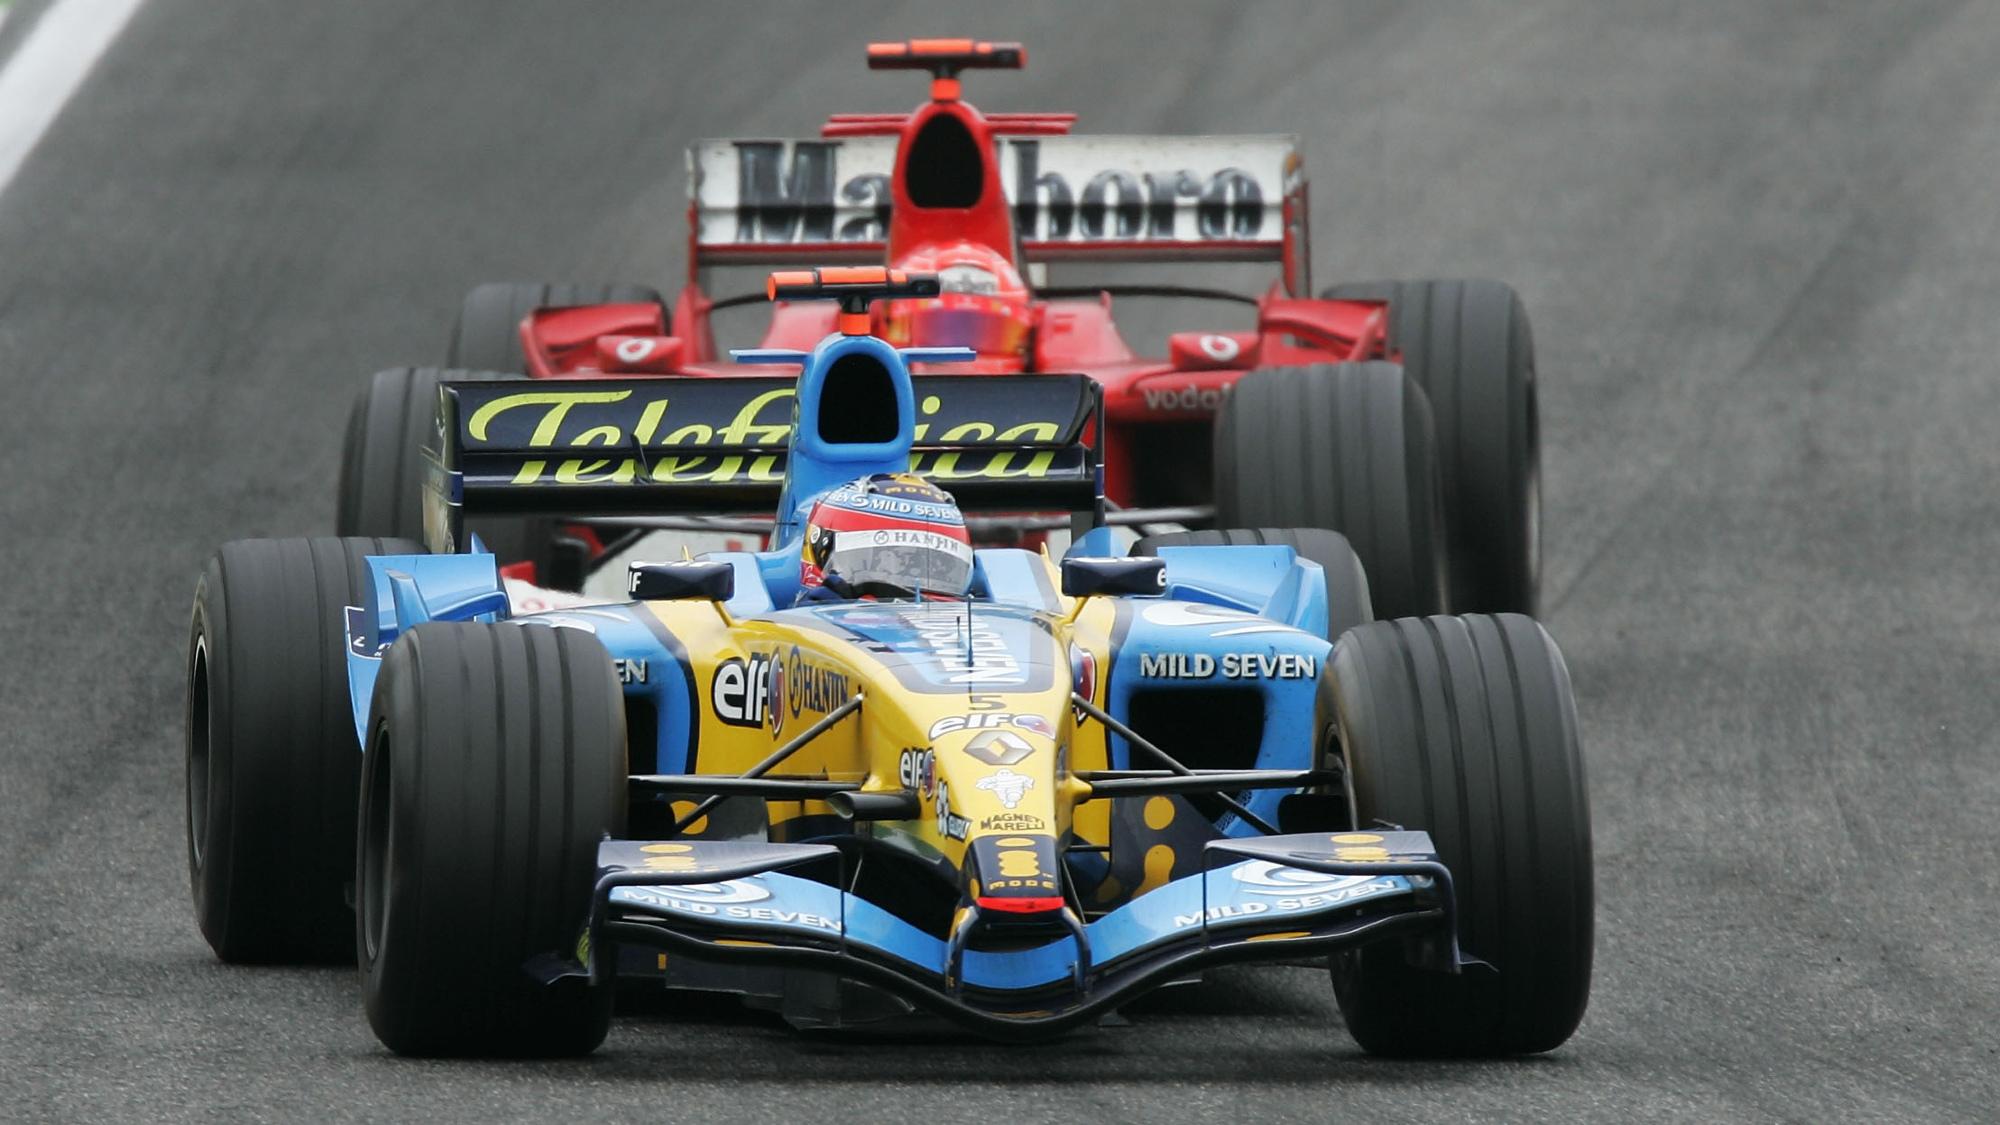 Fernando Alonso, Michael Schumacher 2005 San Marino GP